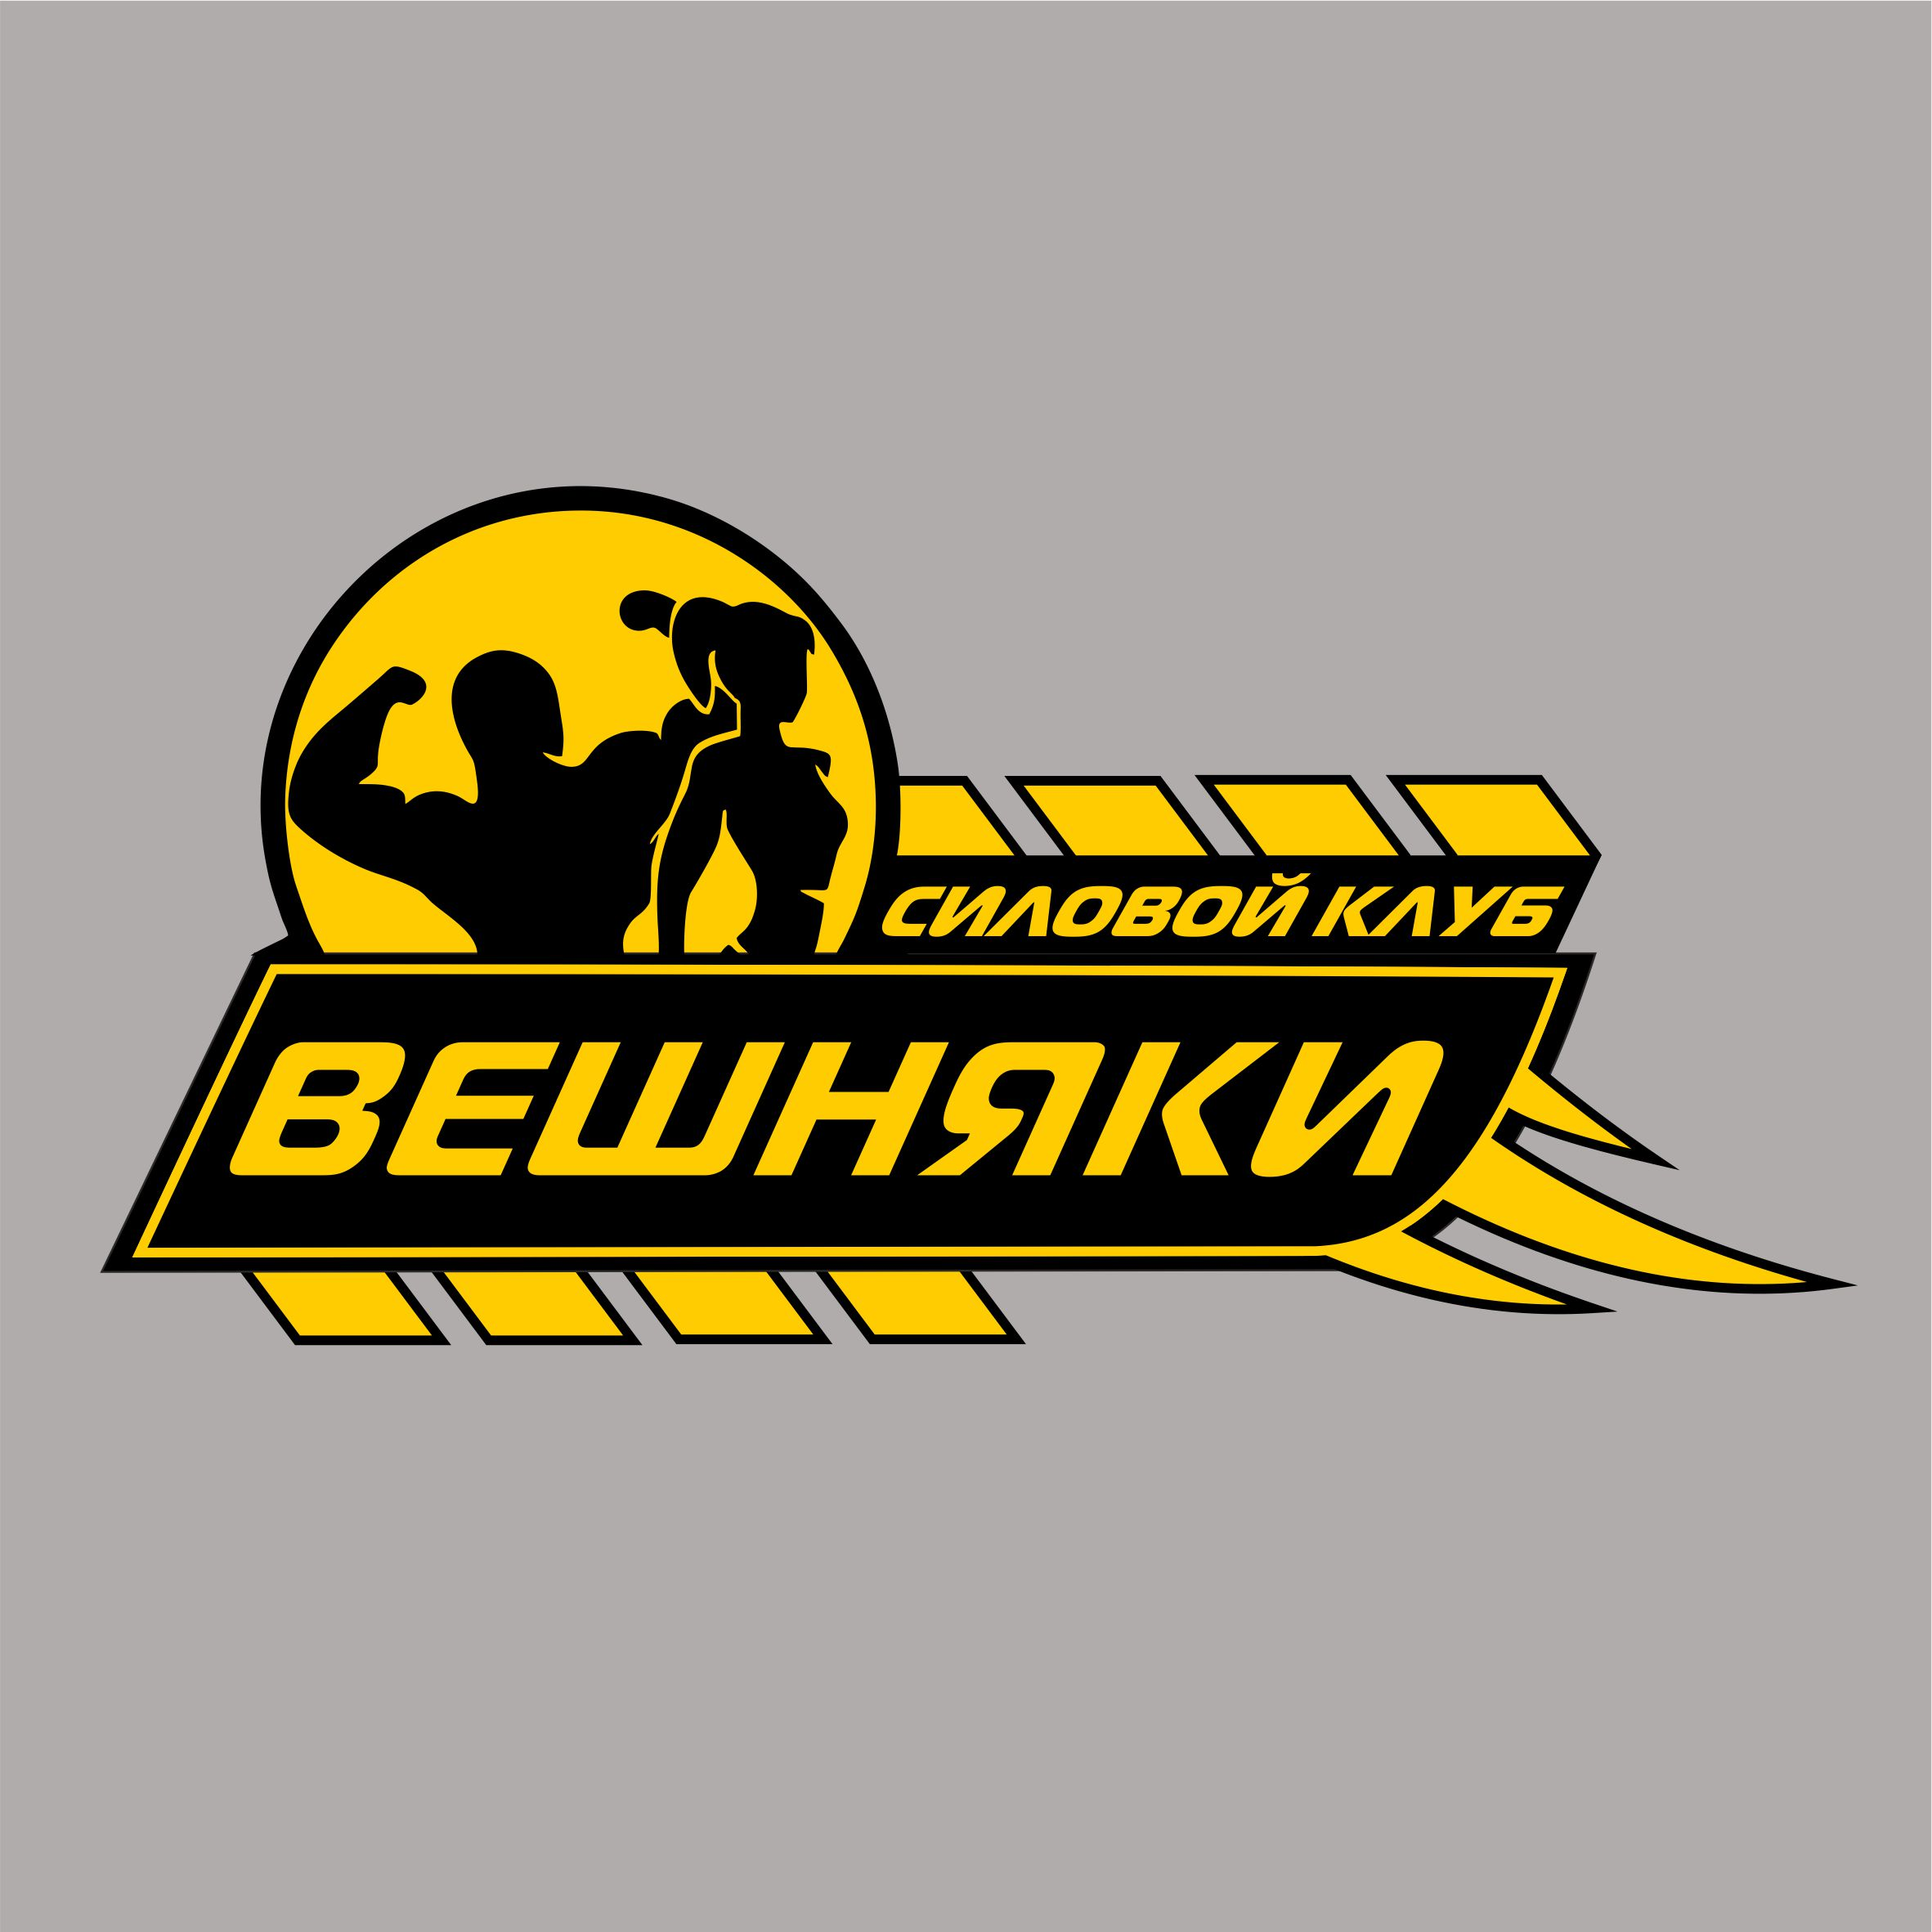 Адаптация (разработка) логотипа Силового клуба ВЕШНЯКИ в инт фото f_1825fbbc76055768.jpg